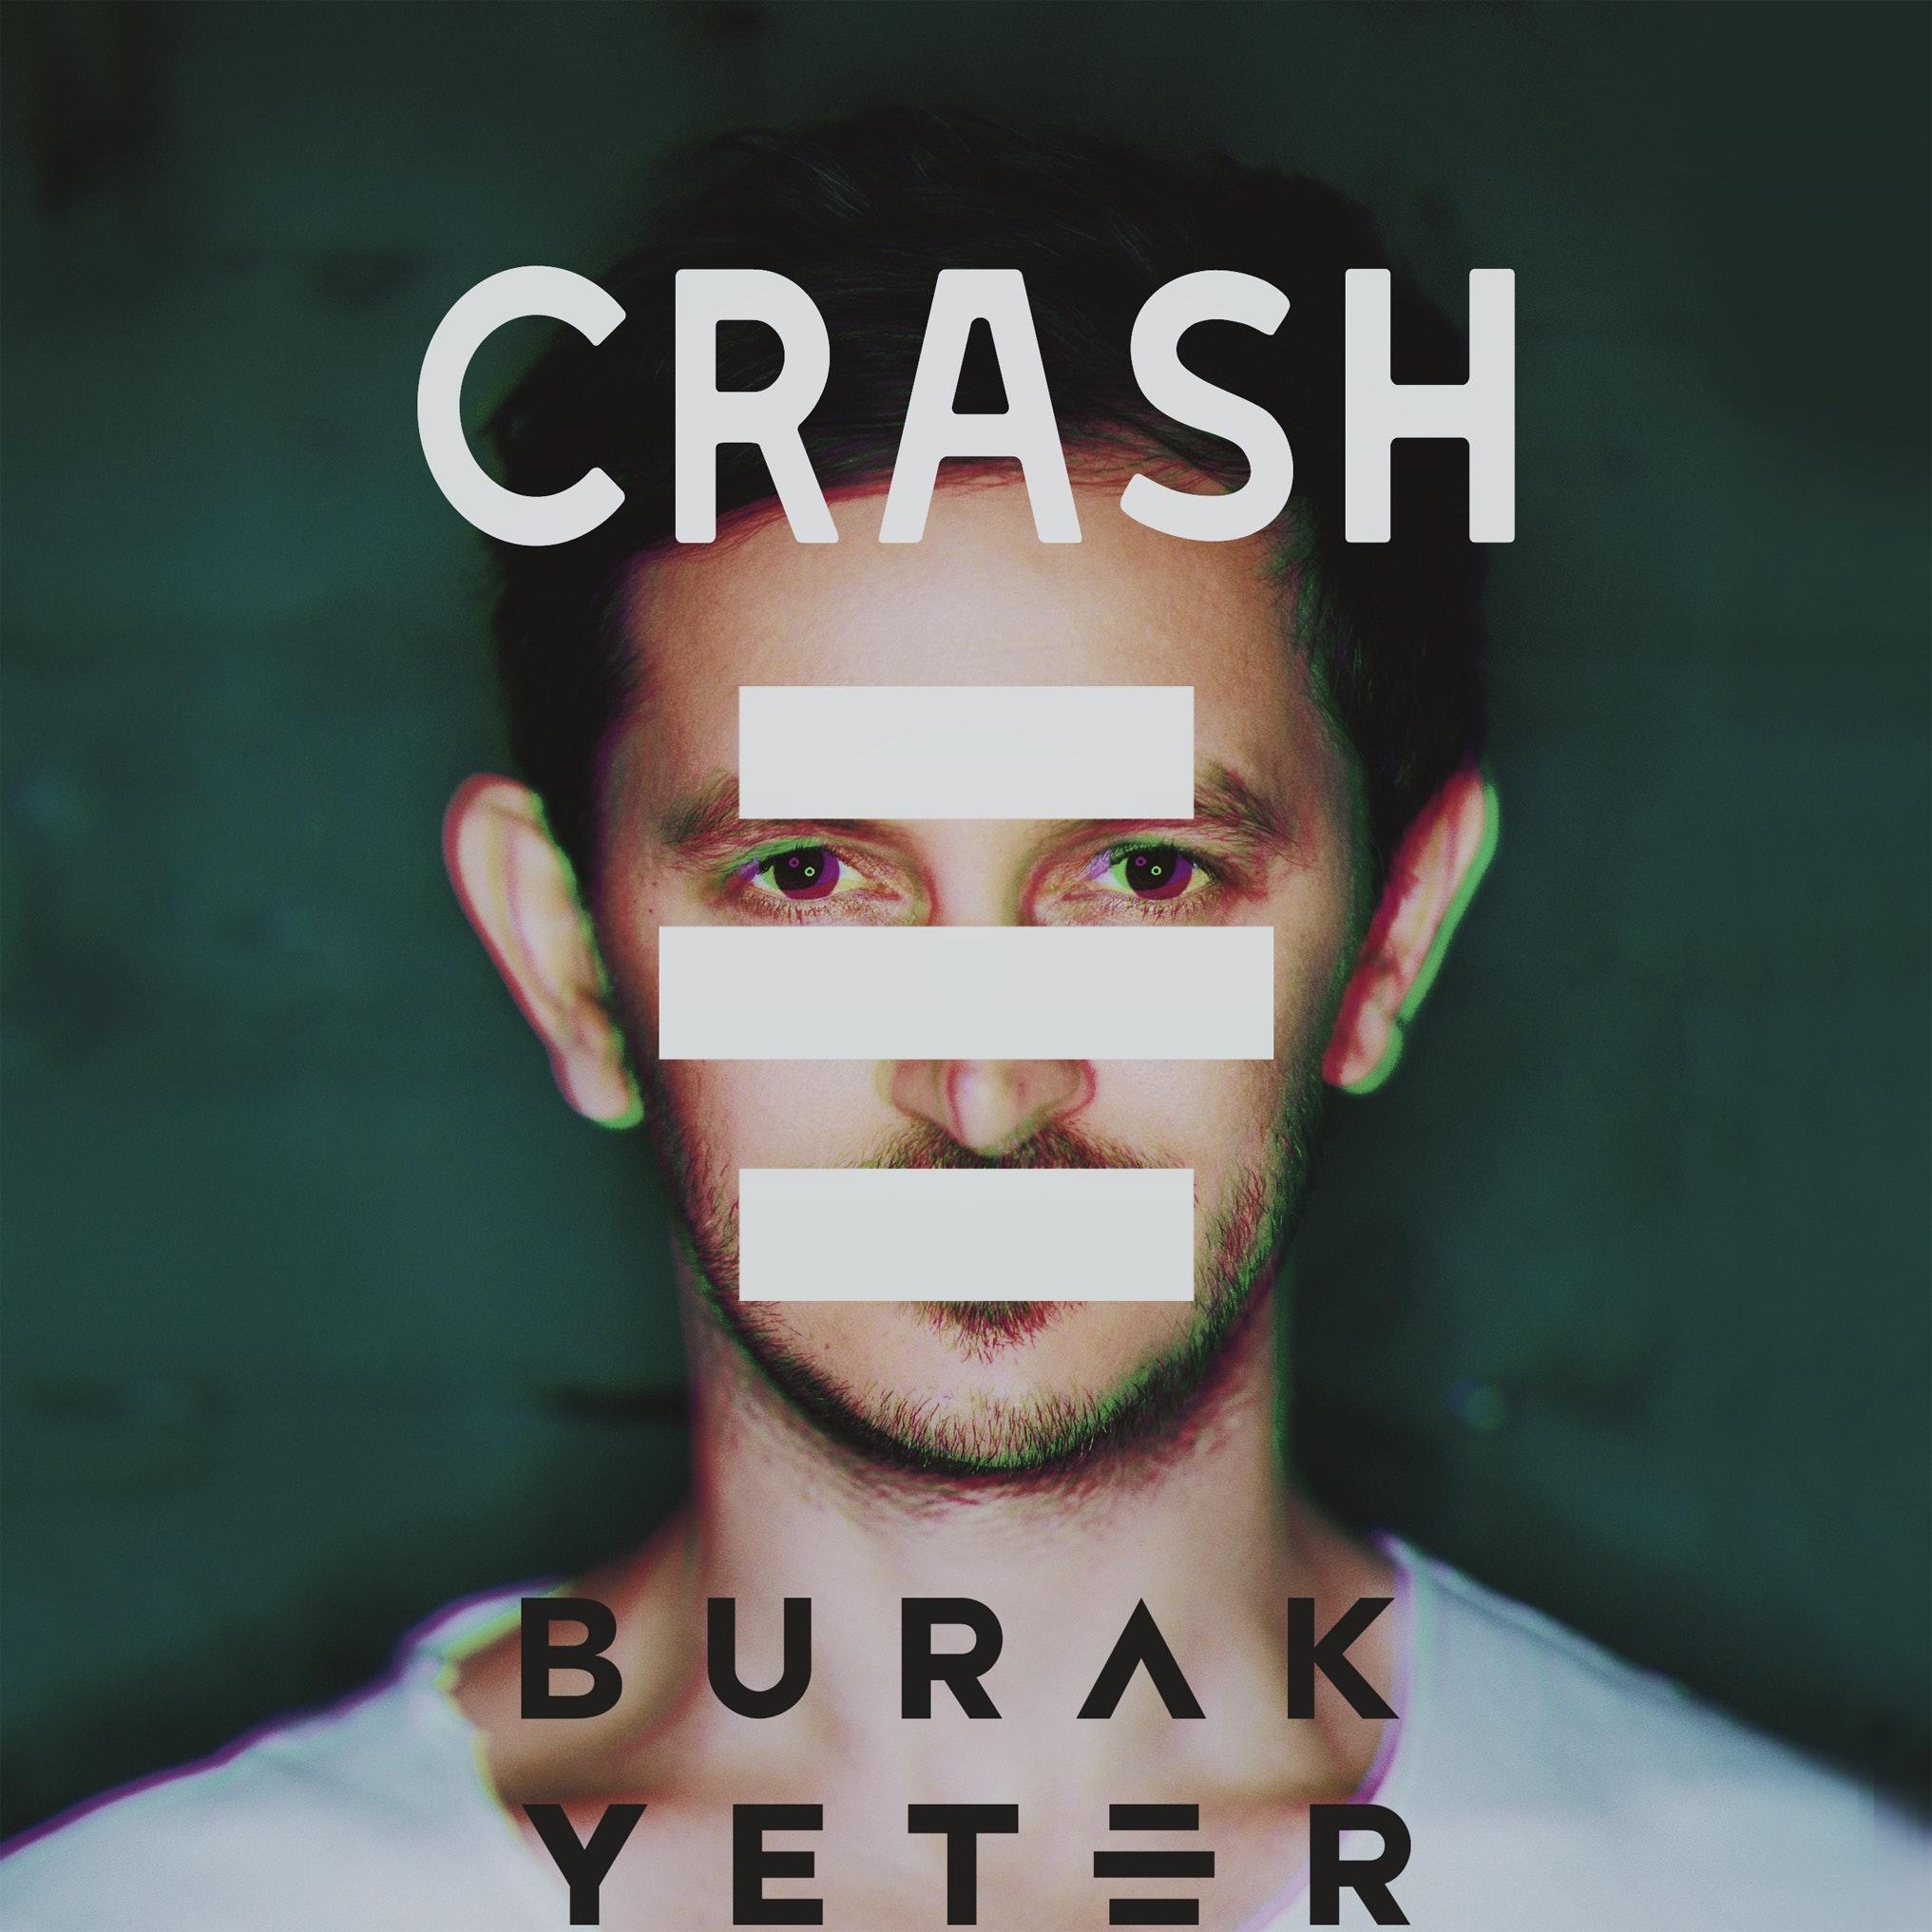 Burak Yeter Crash single cover